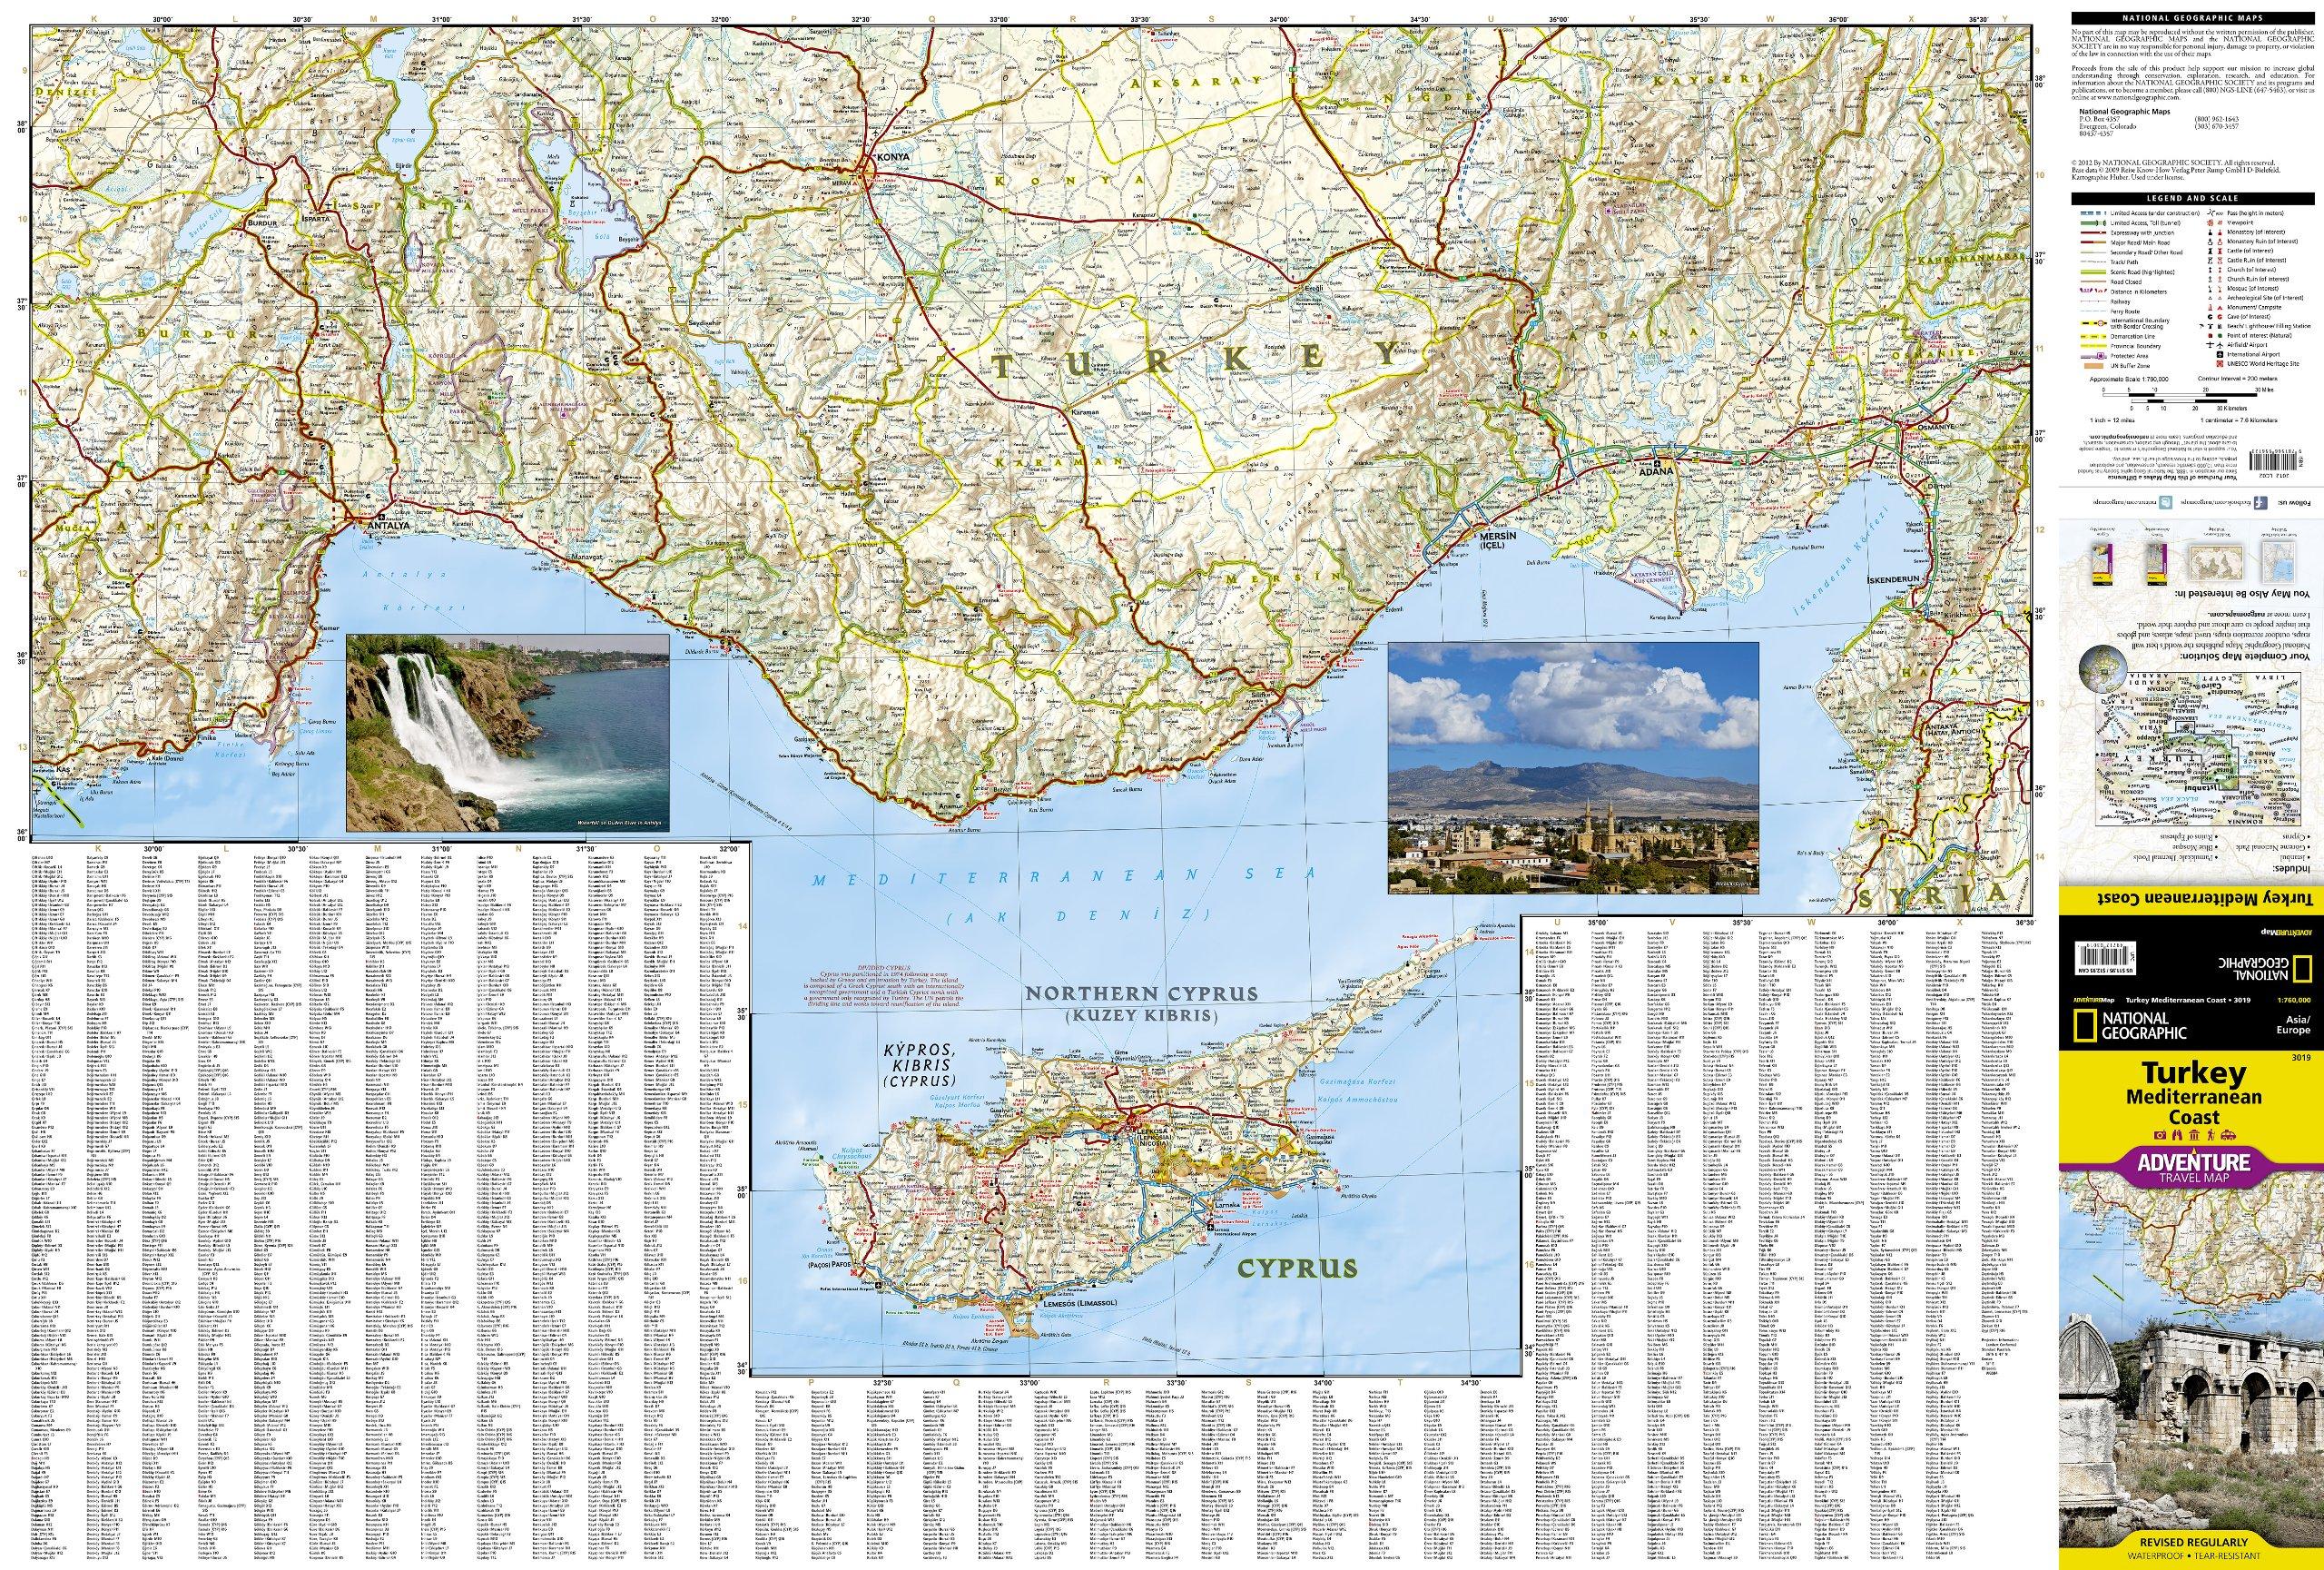 Welcome to Antalya & the Turquoise Coast